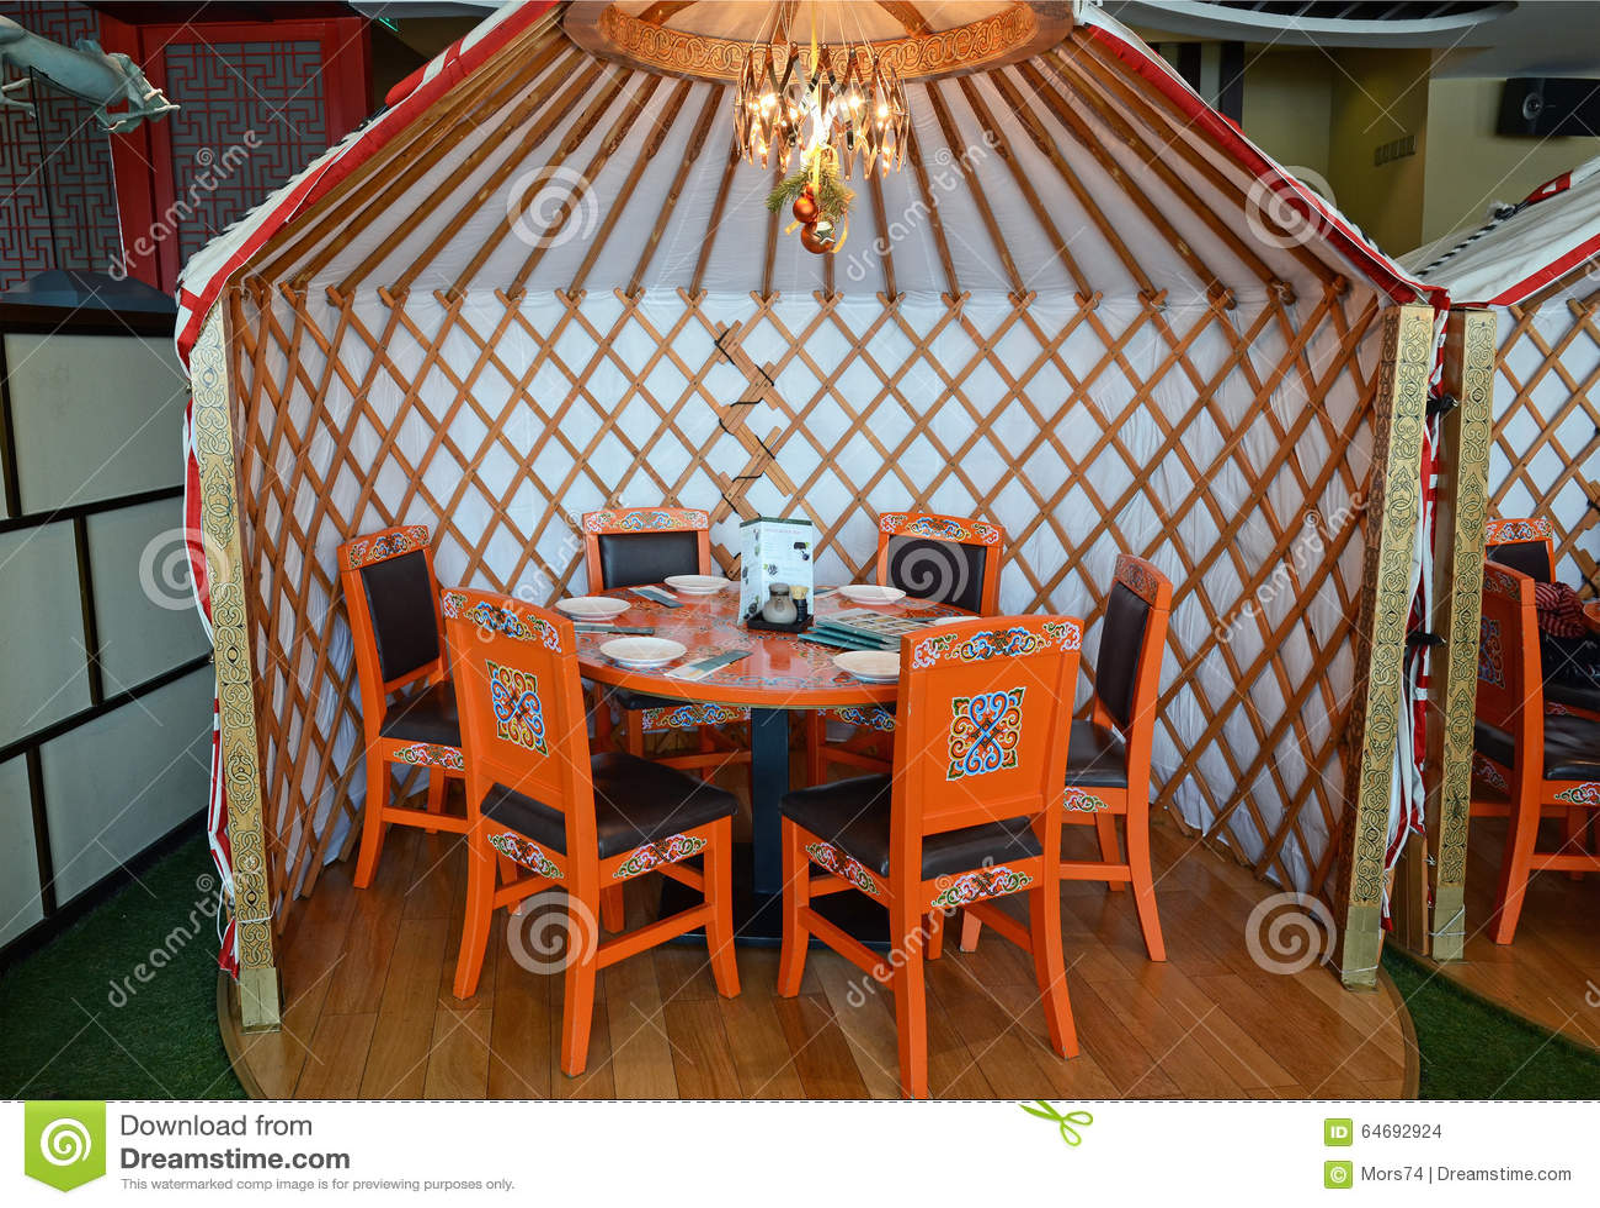 Ulaanbaatar, Mongolië - 02 Dec, 2015: Binnenland van nationaal Mongools keukenrestaurant